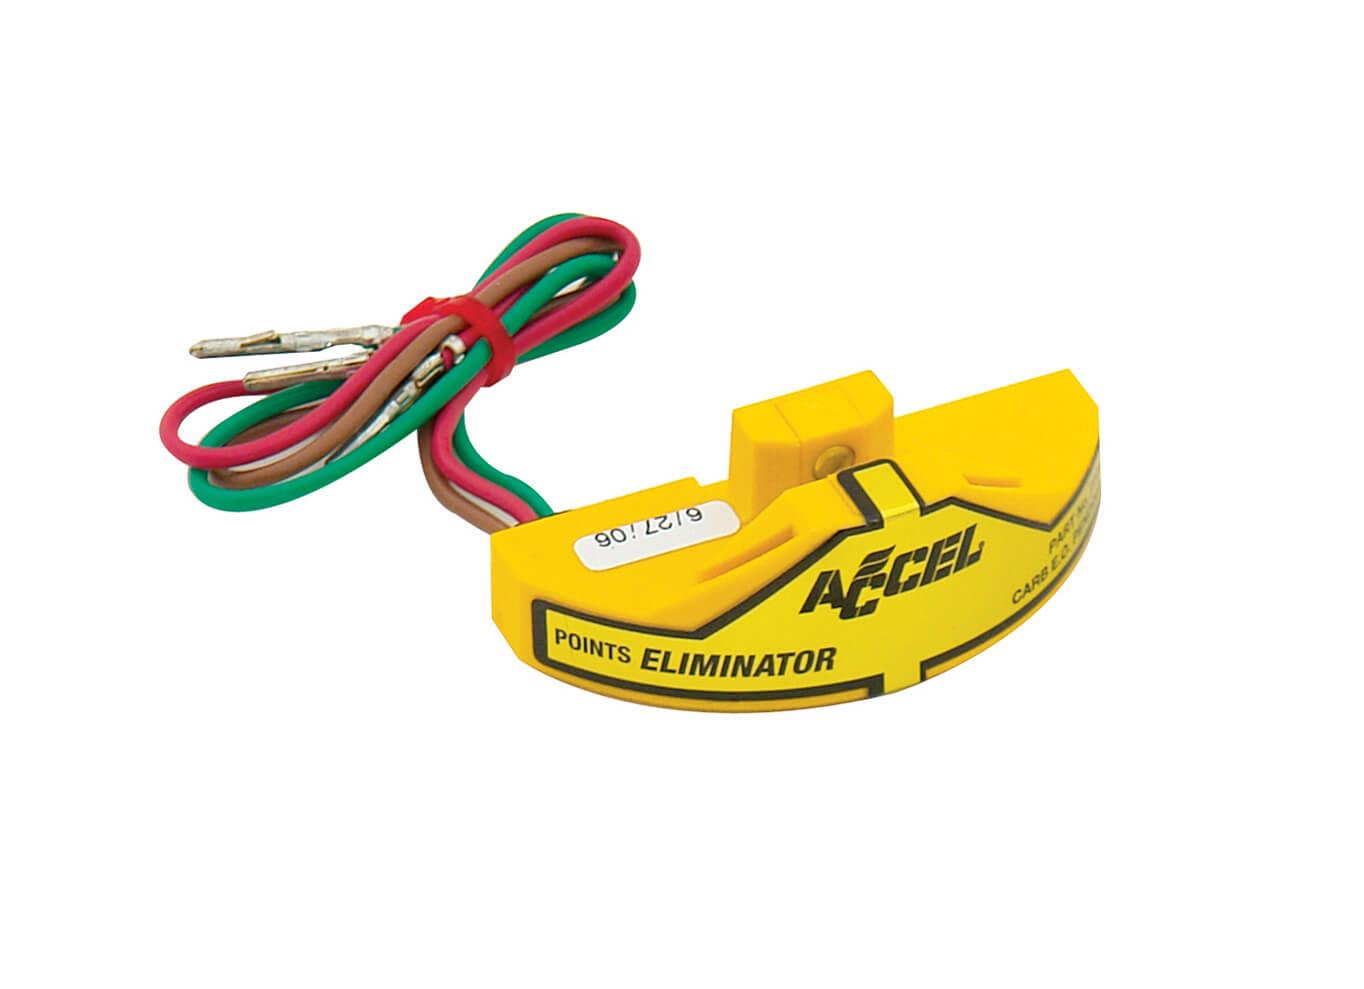 HR_4426] Accel Points Eliminator Wiring Diagram Schematic WiringCapem Egre Rosz Xorcede Arnes Gue45 Mohammedshrine Librar Wiring 101